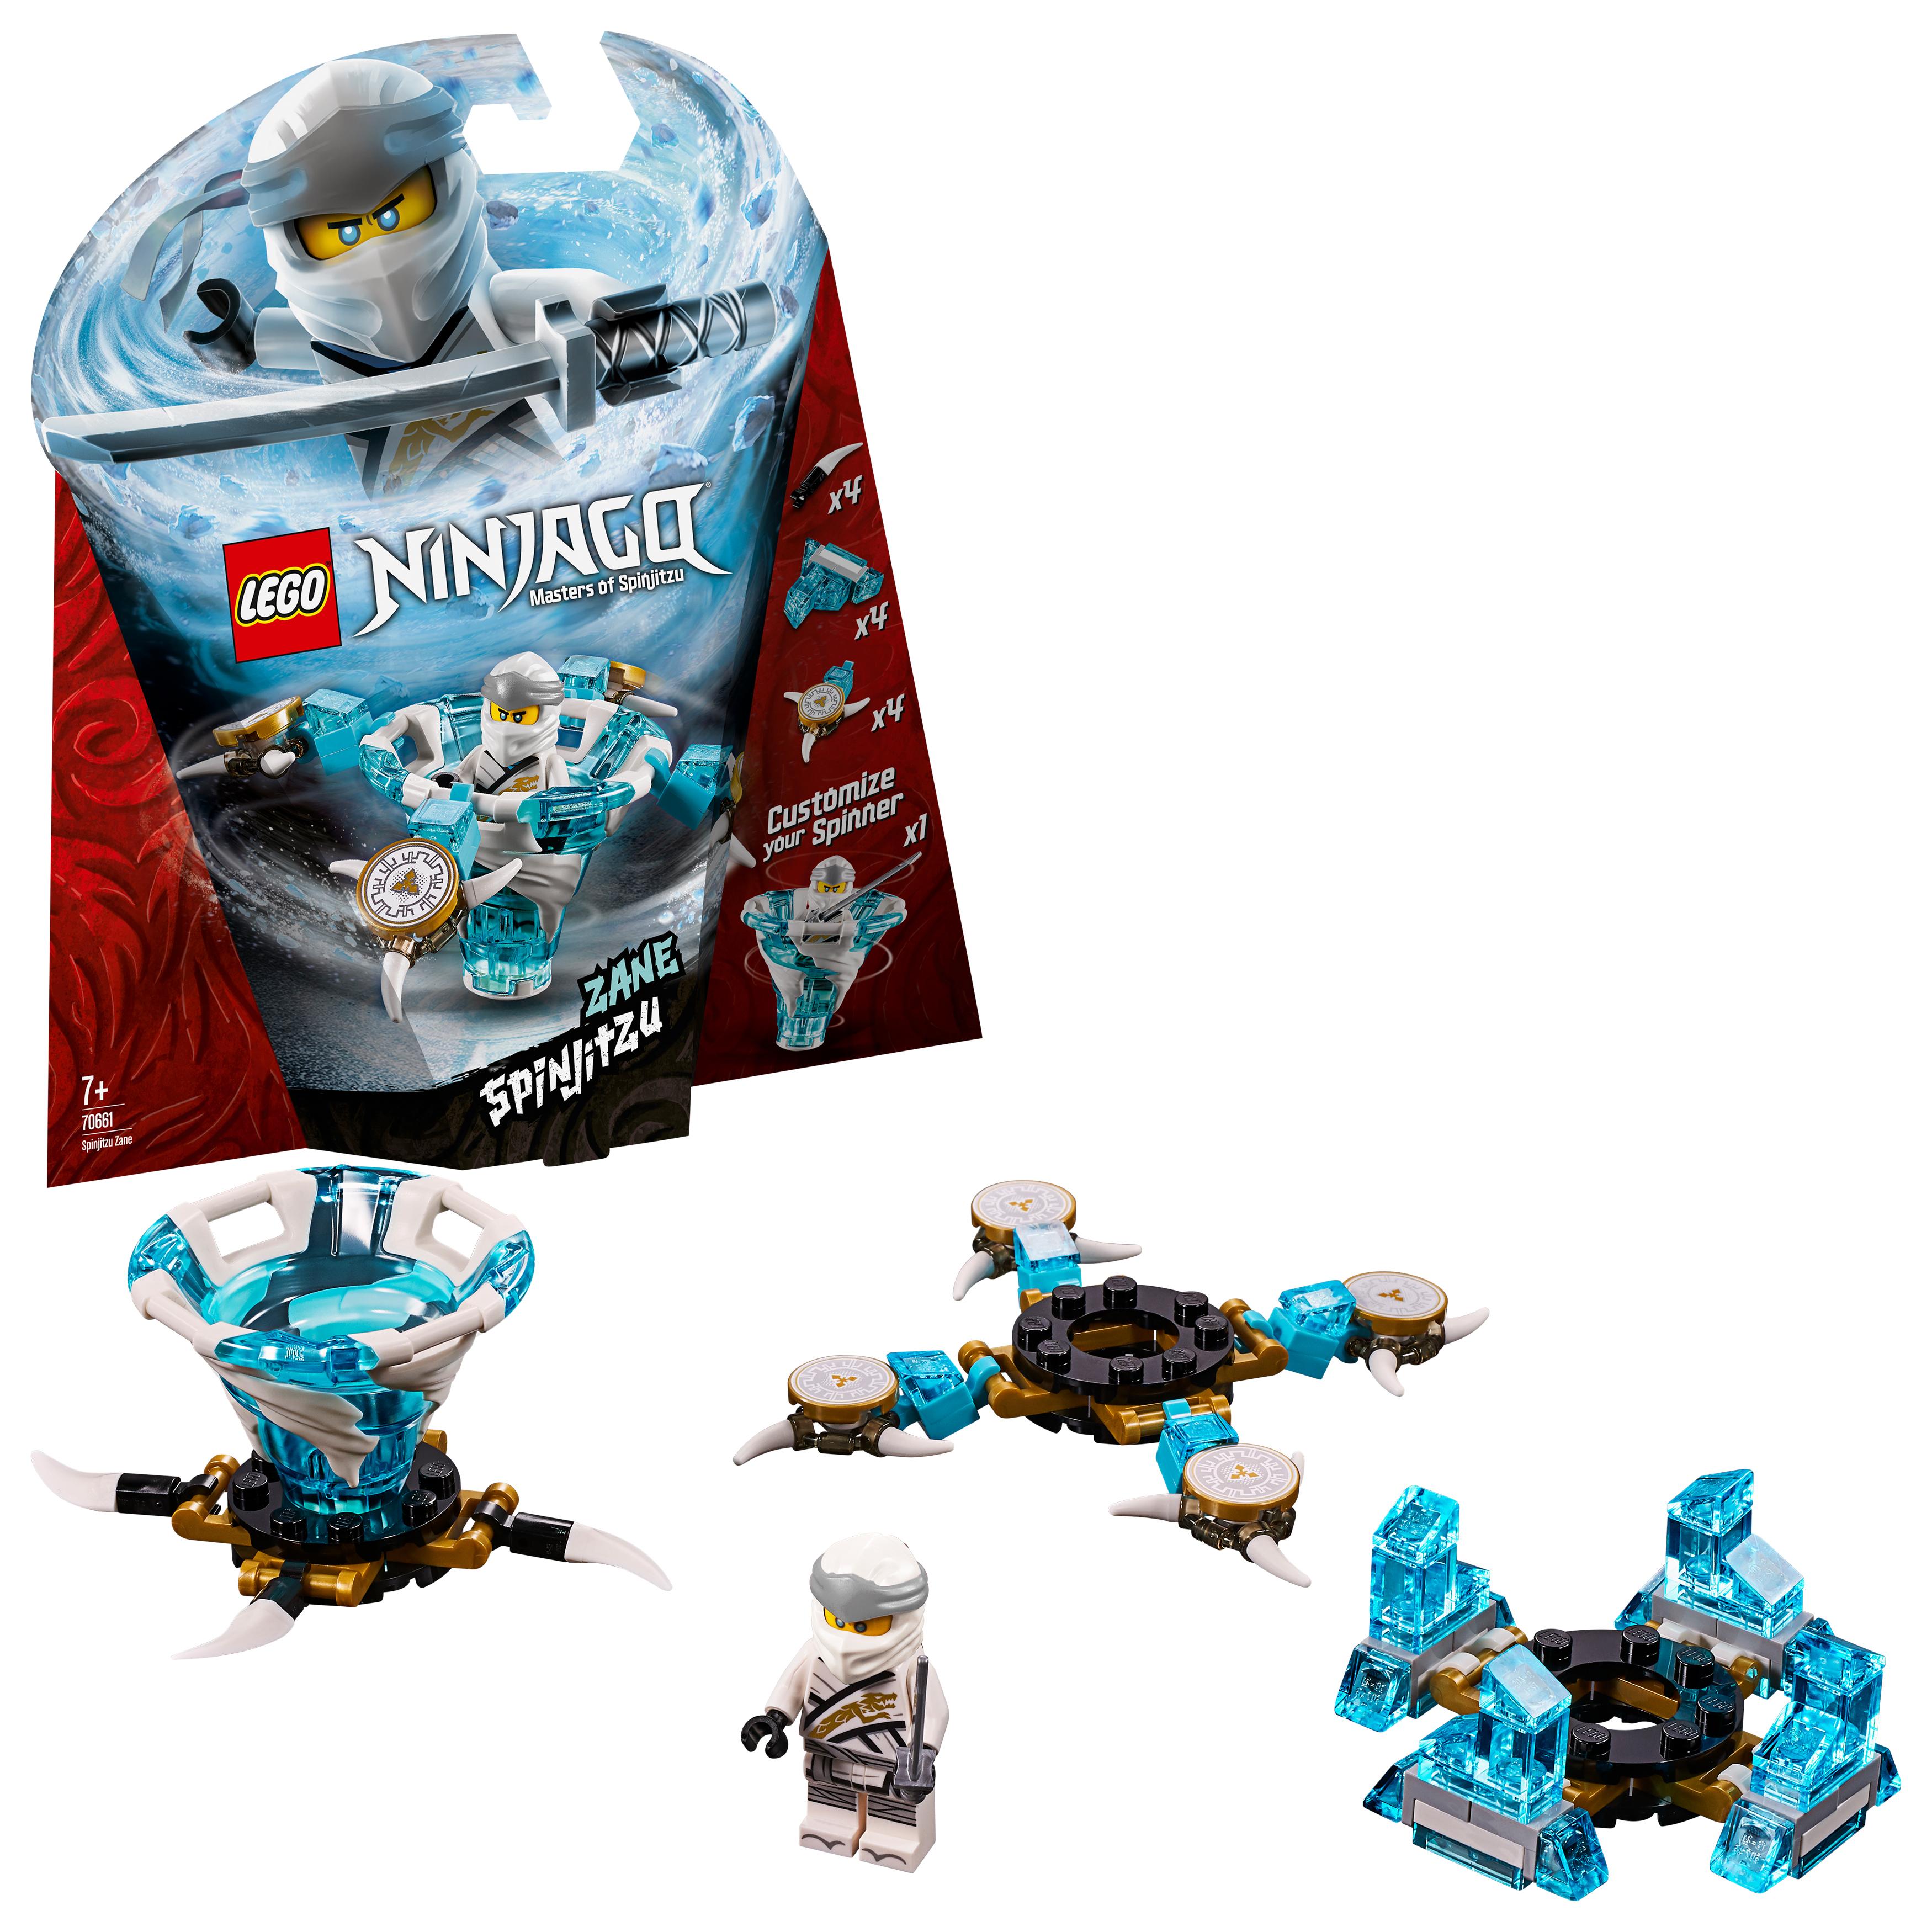 LEGO Ninjago - Spinjitzu Zane (70661)